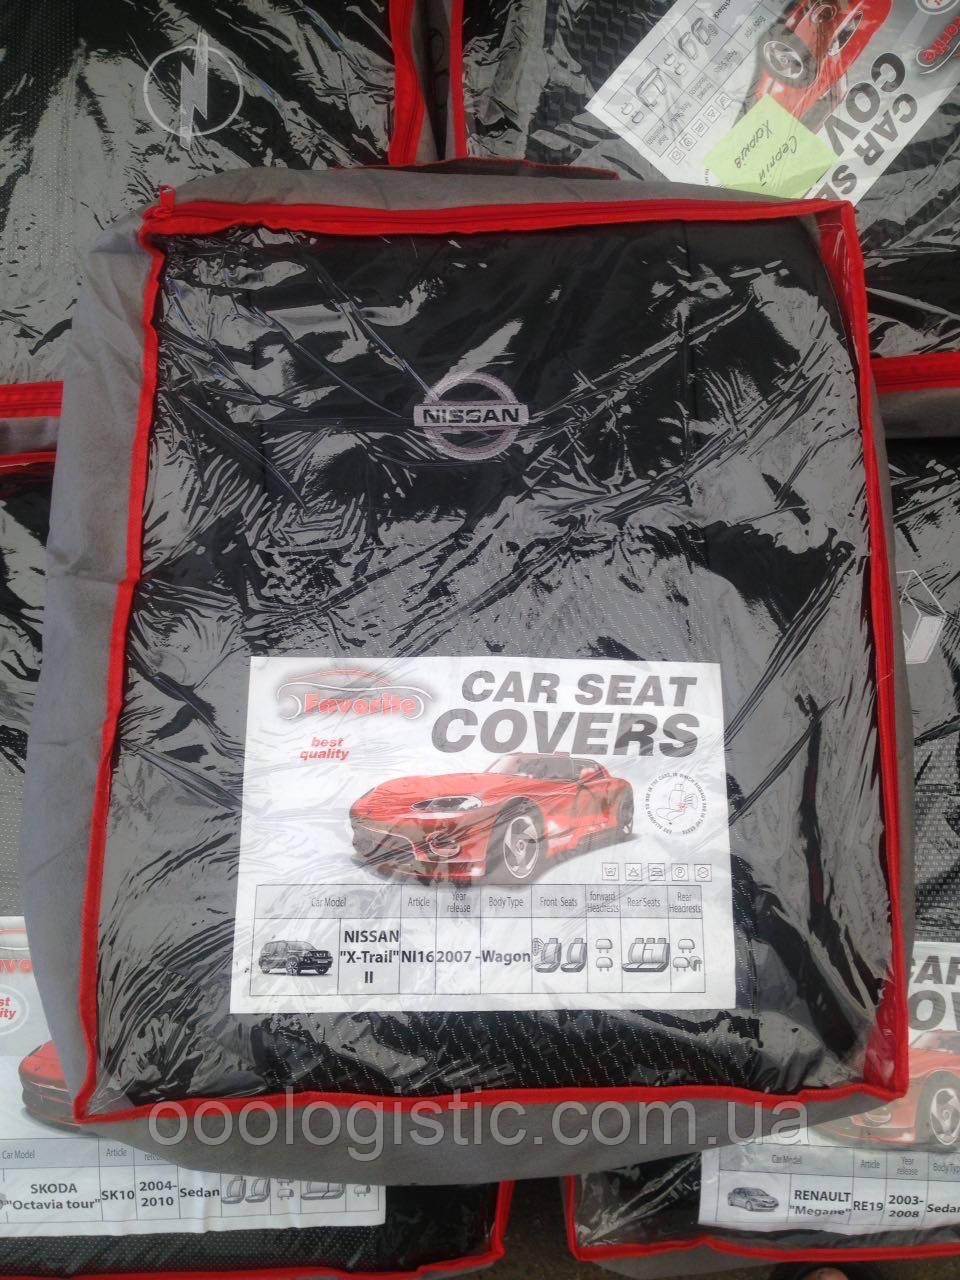 Авточехлы  Favorite на Nissan X-Trail 2 2007-wagon